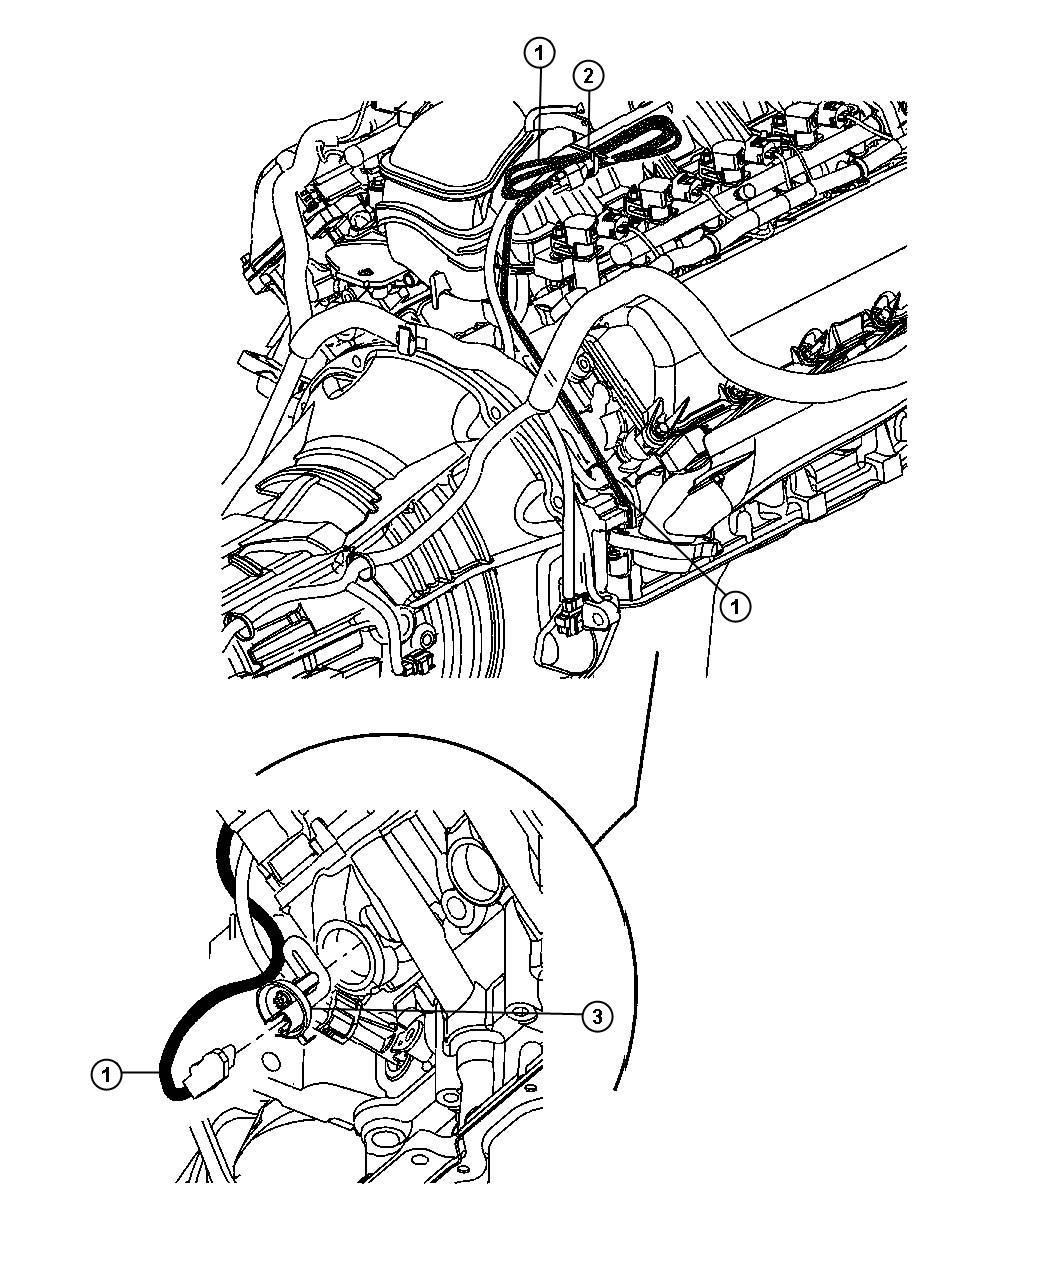 Dodge Dakota Heater Engine Engine Block 4 7l V8 Engines